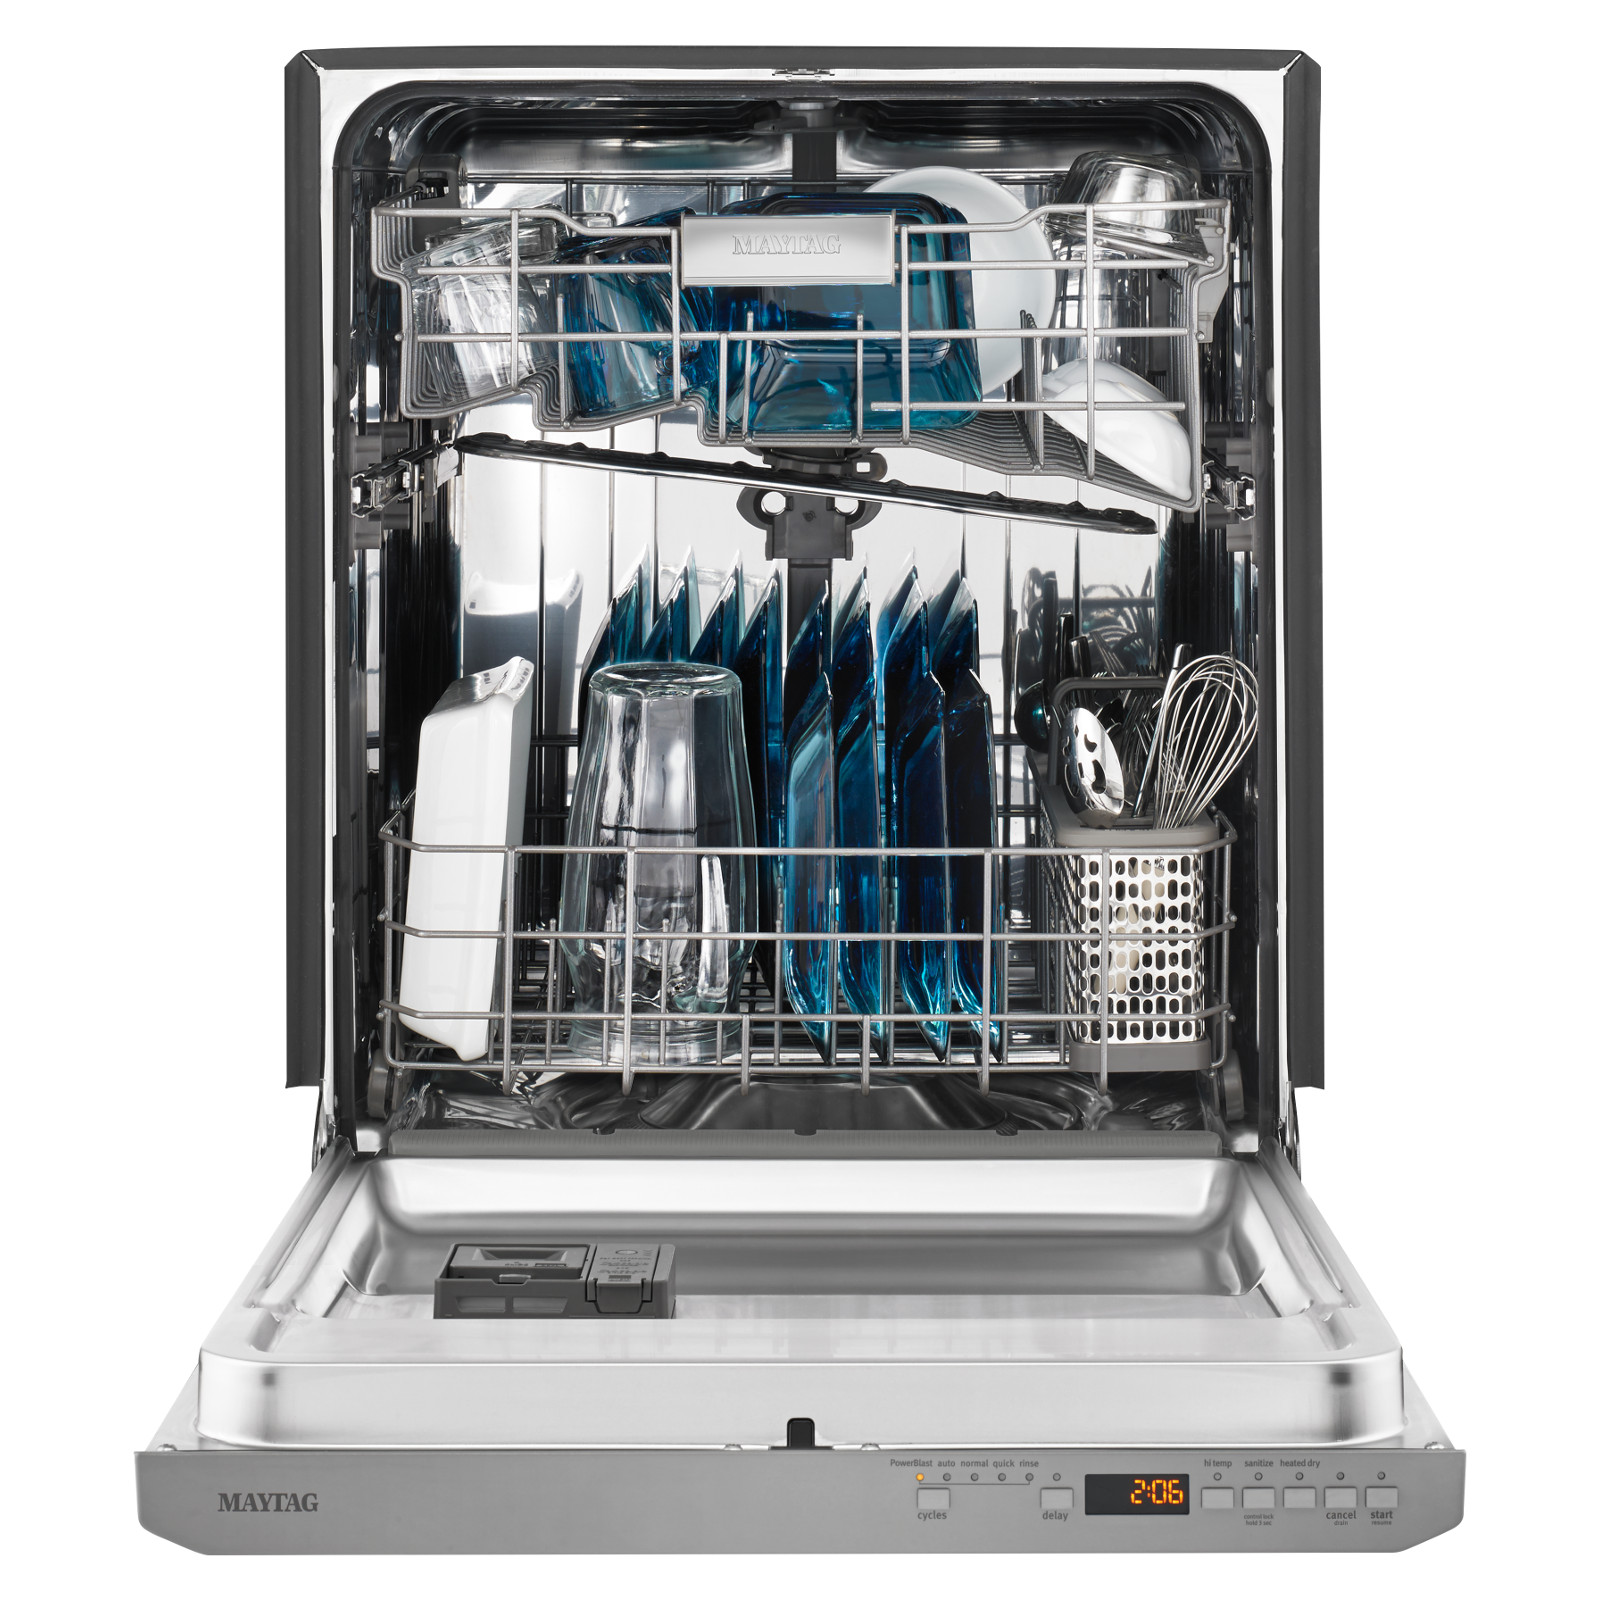 maytag mdb8959sfz 24 top control dishwasher w fingerprint resistant stainless steel exterior stainless steel